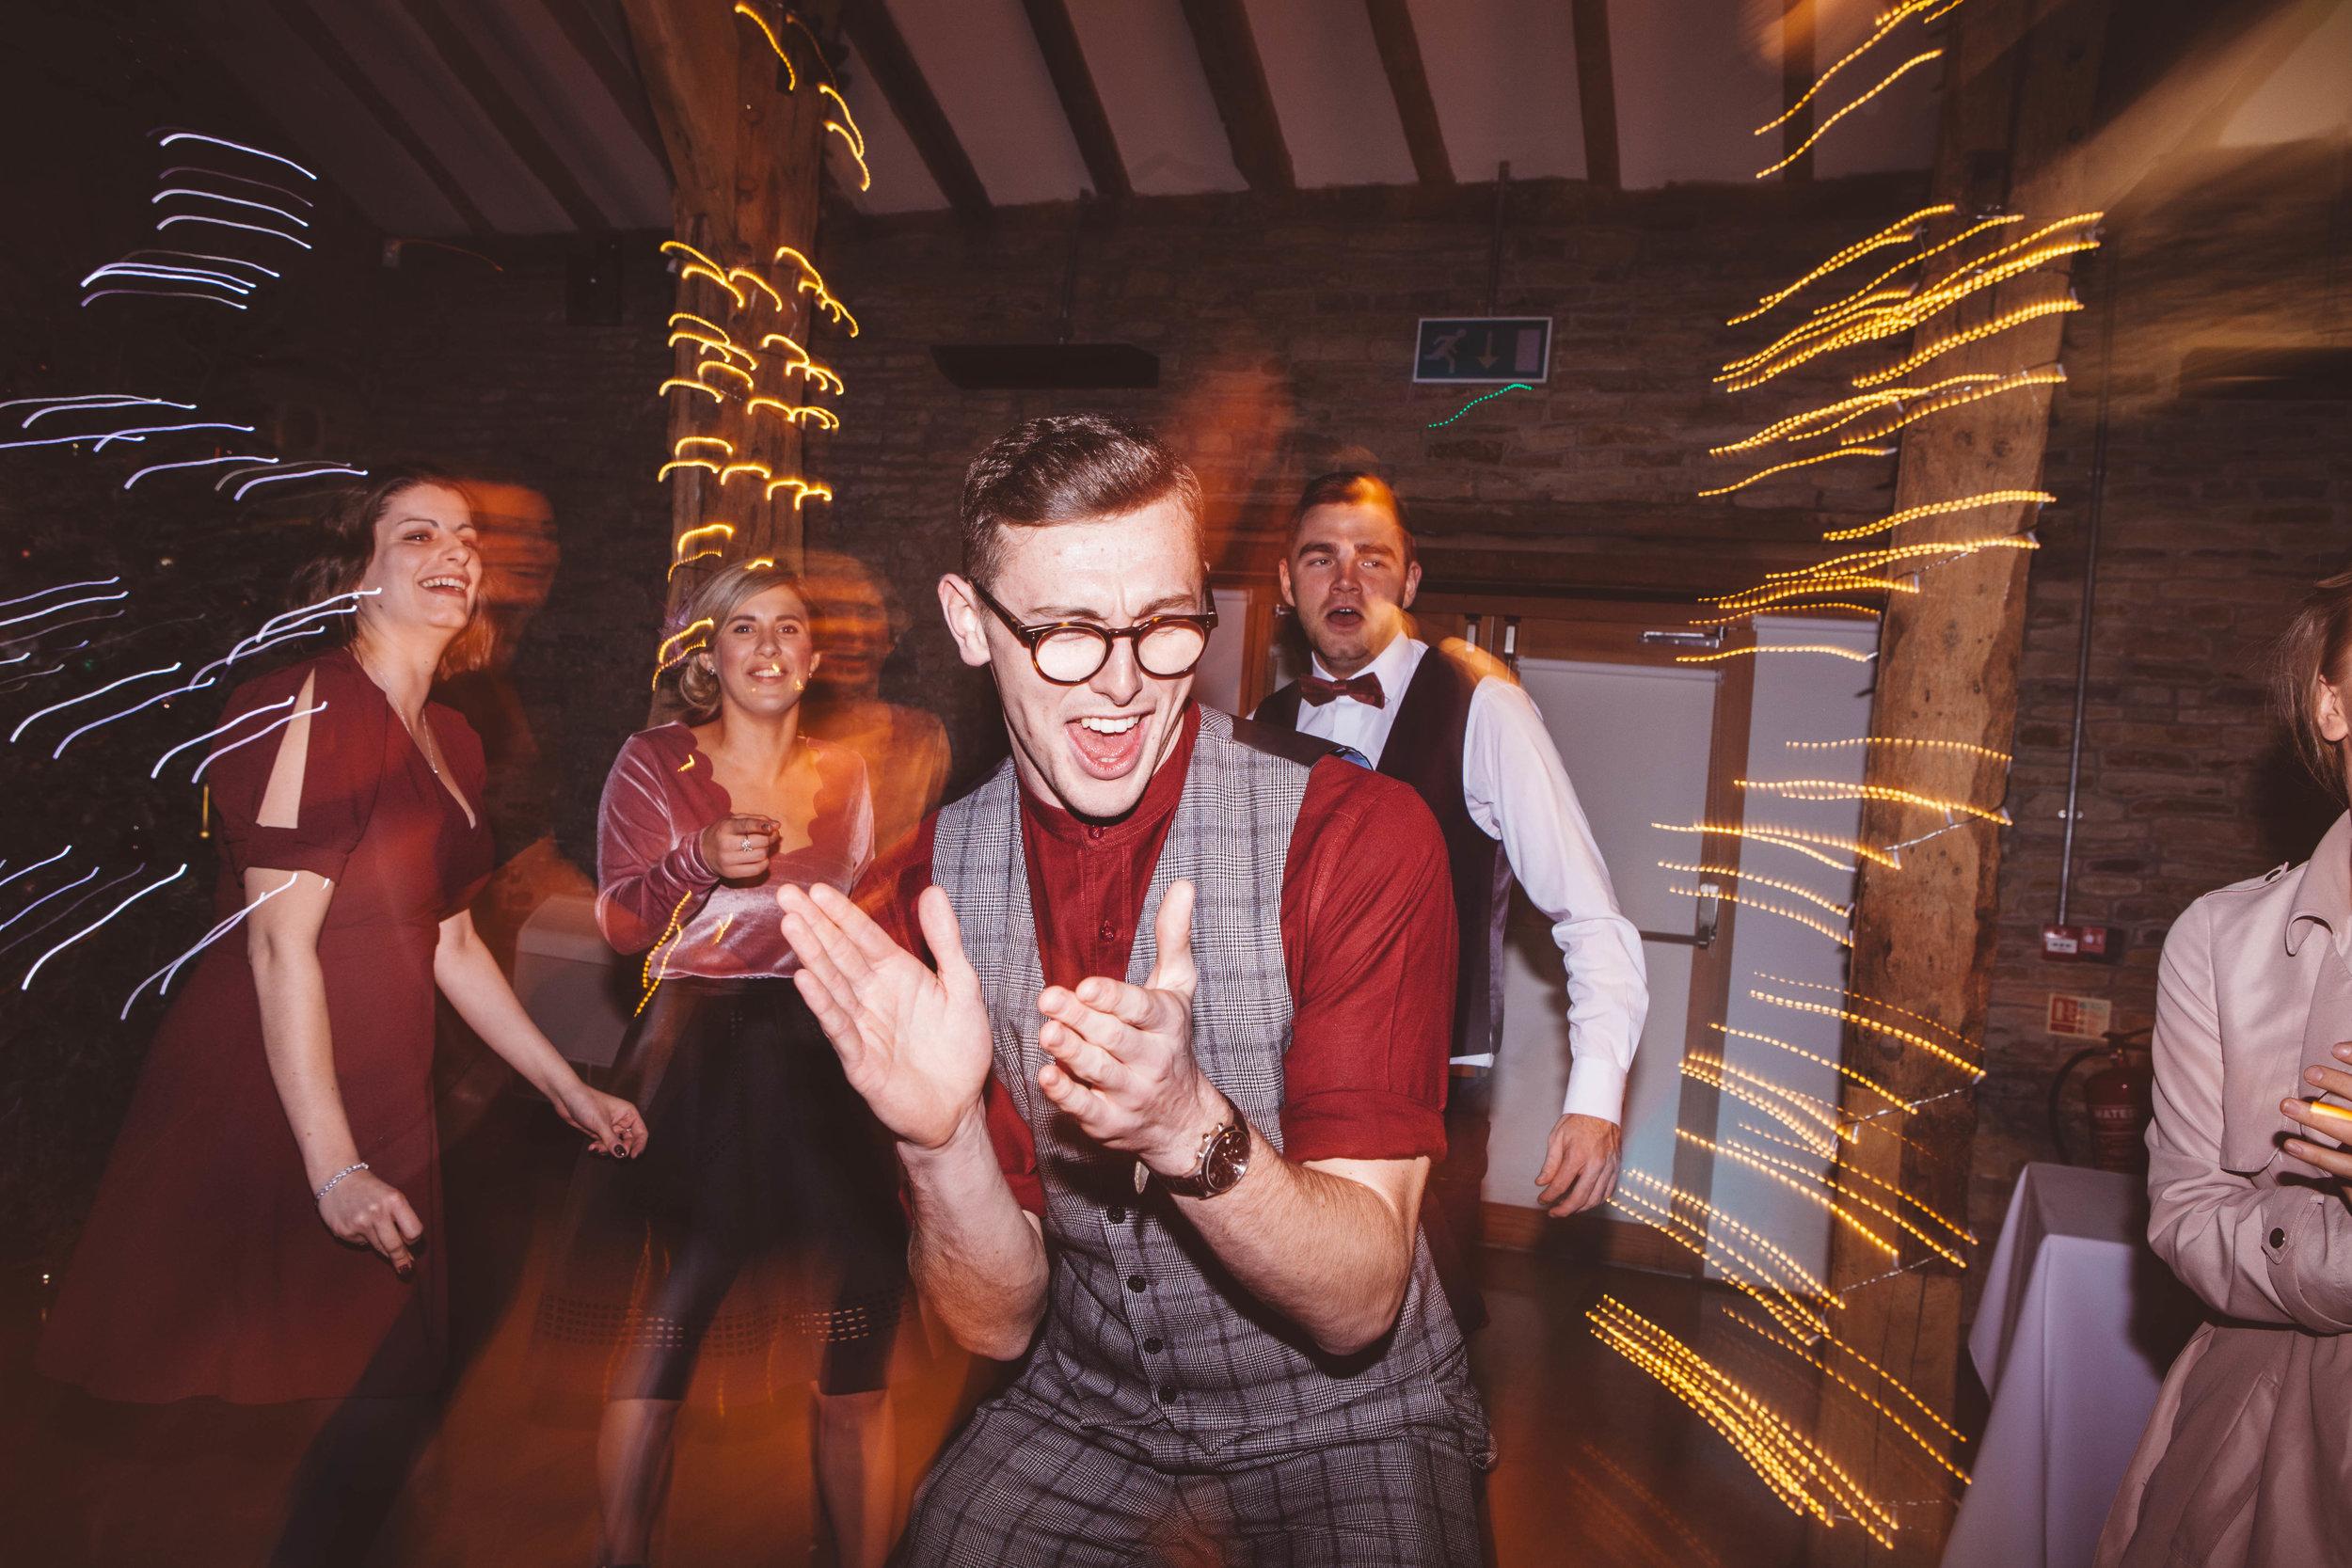 The-Northorpe-Barn-Wedding-Photography-2017-22.jpg